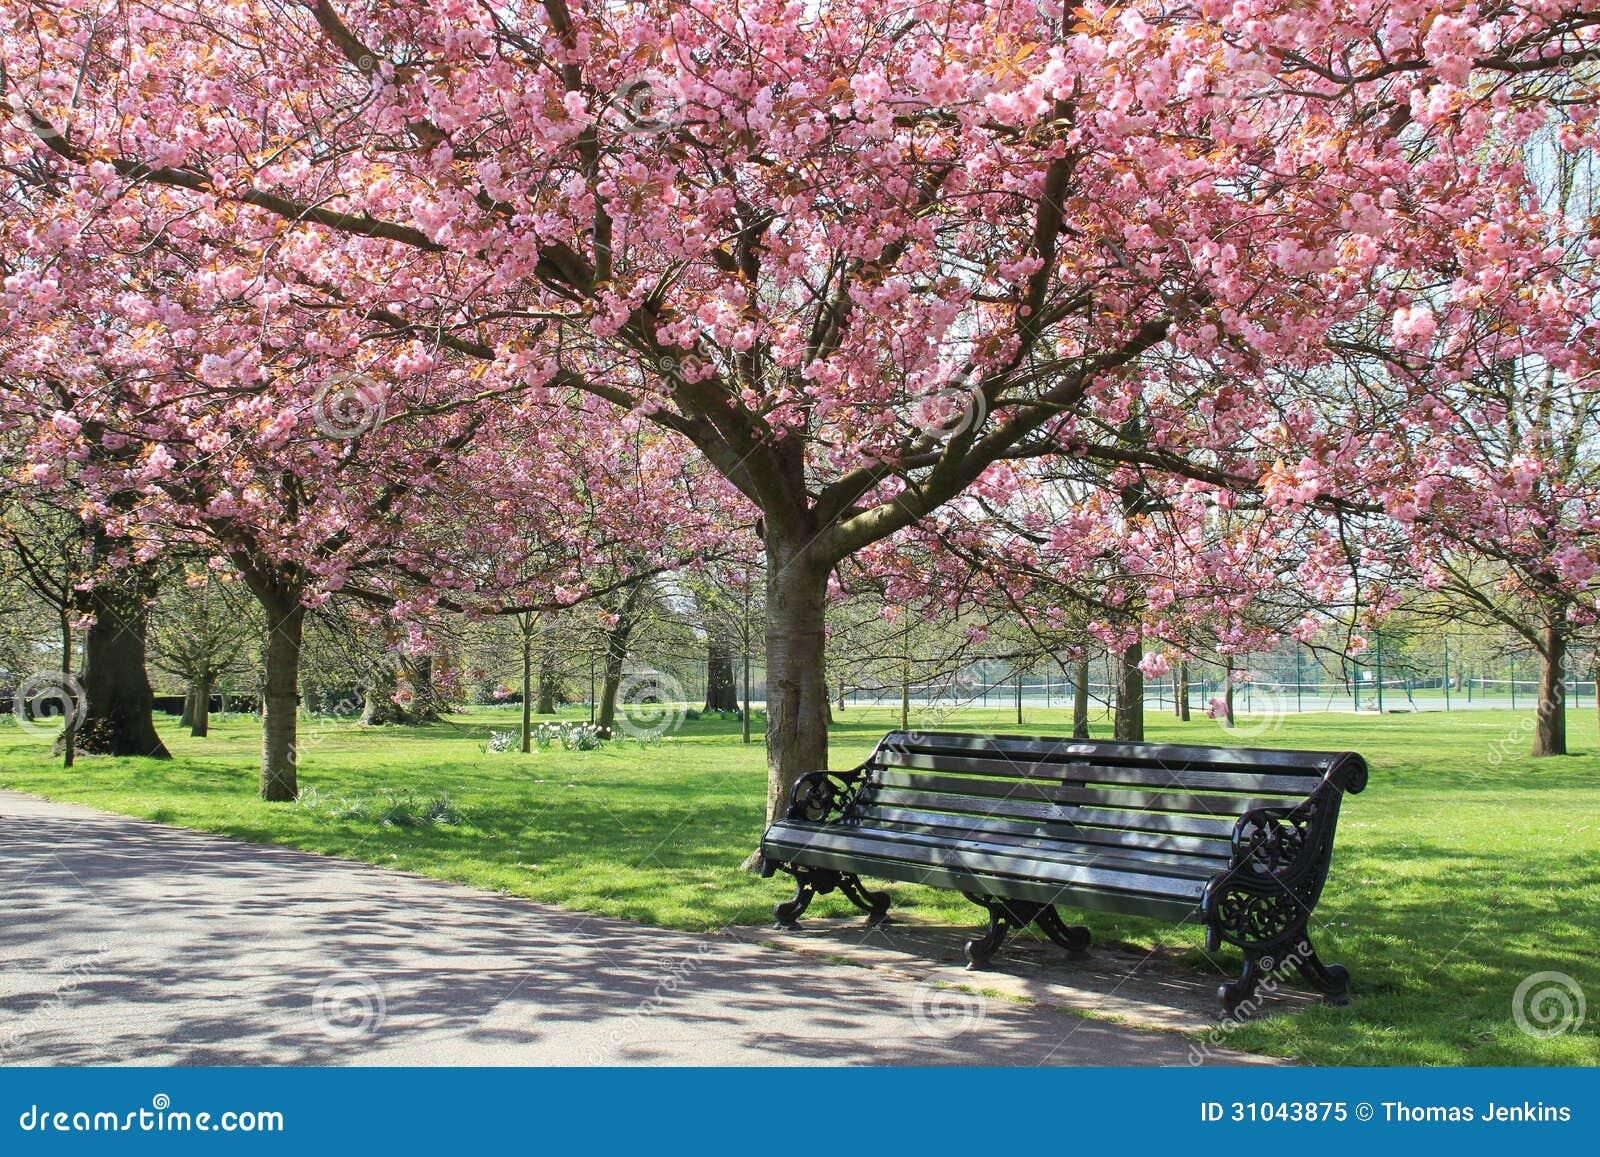 blossom park tree pink - photo #19